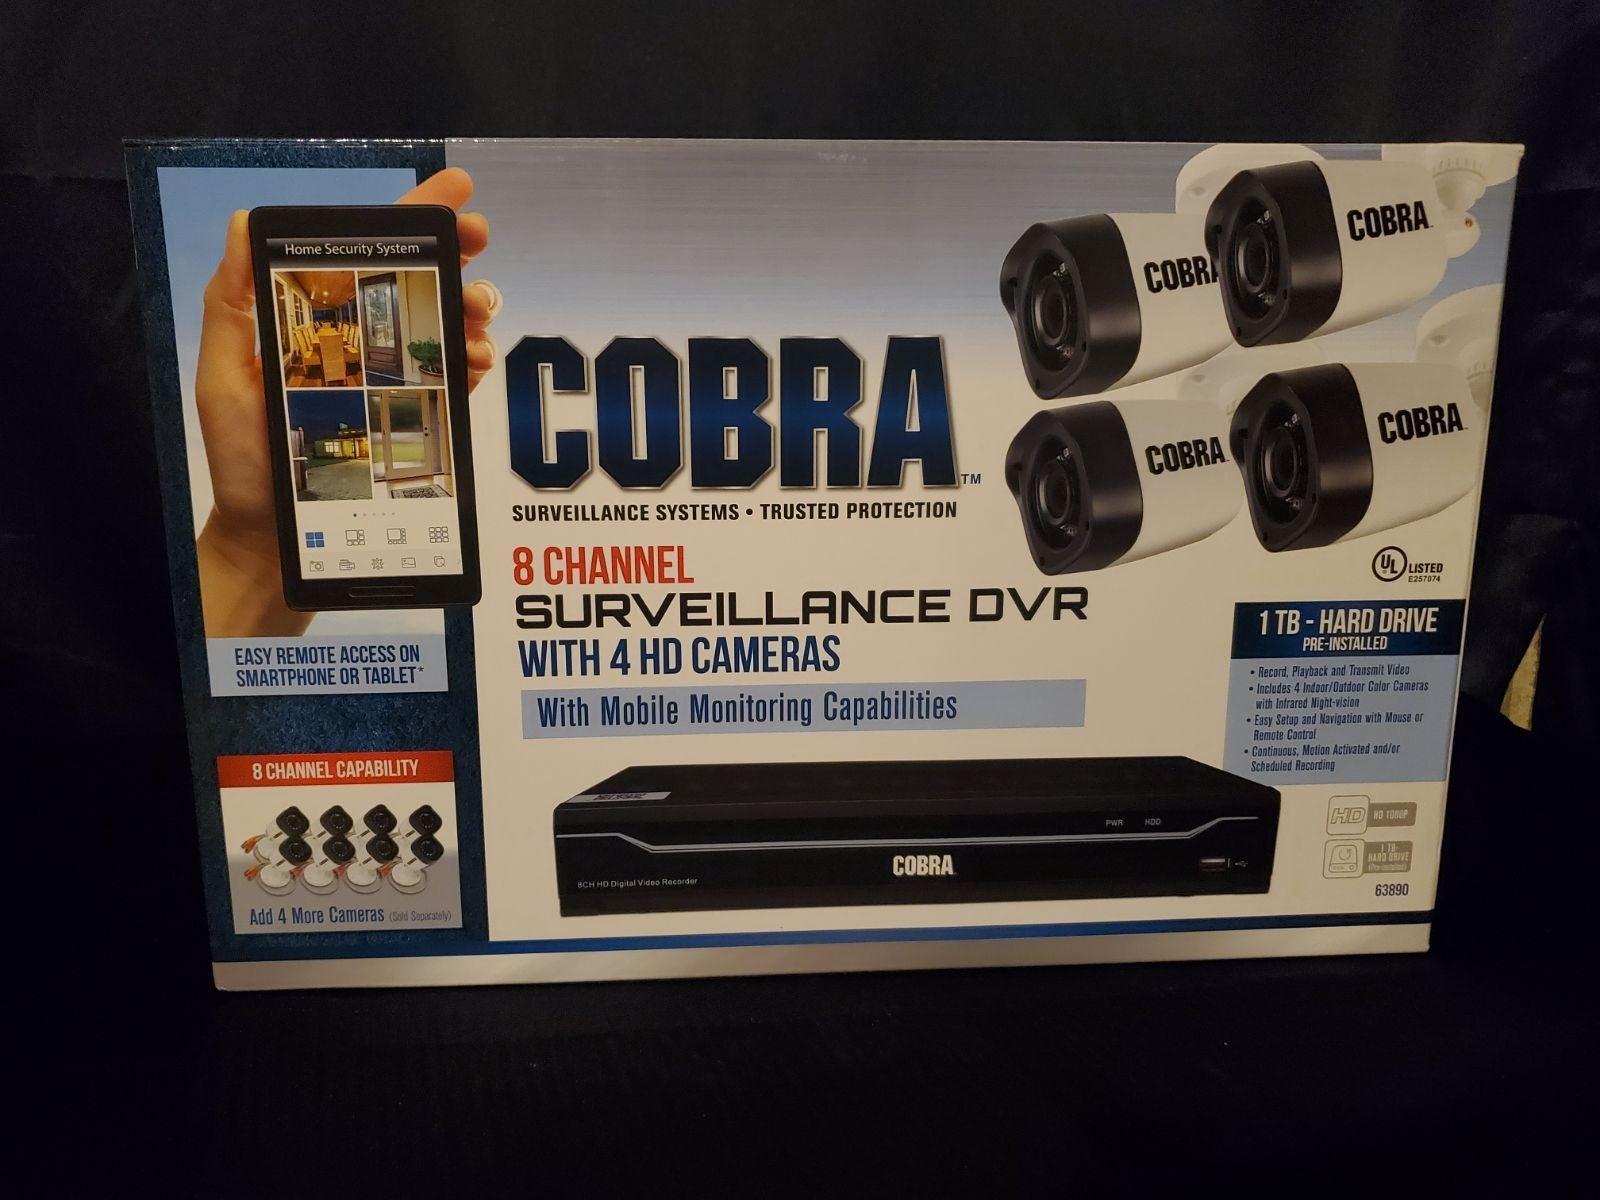 Cobra surveillance system